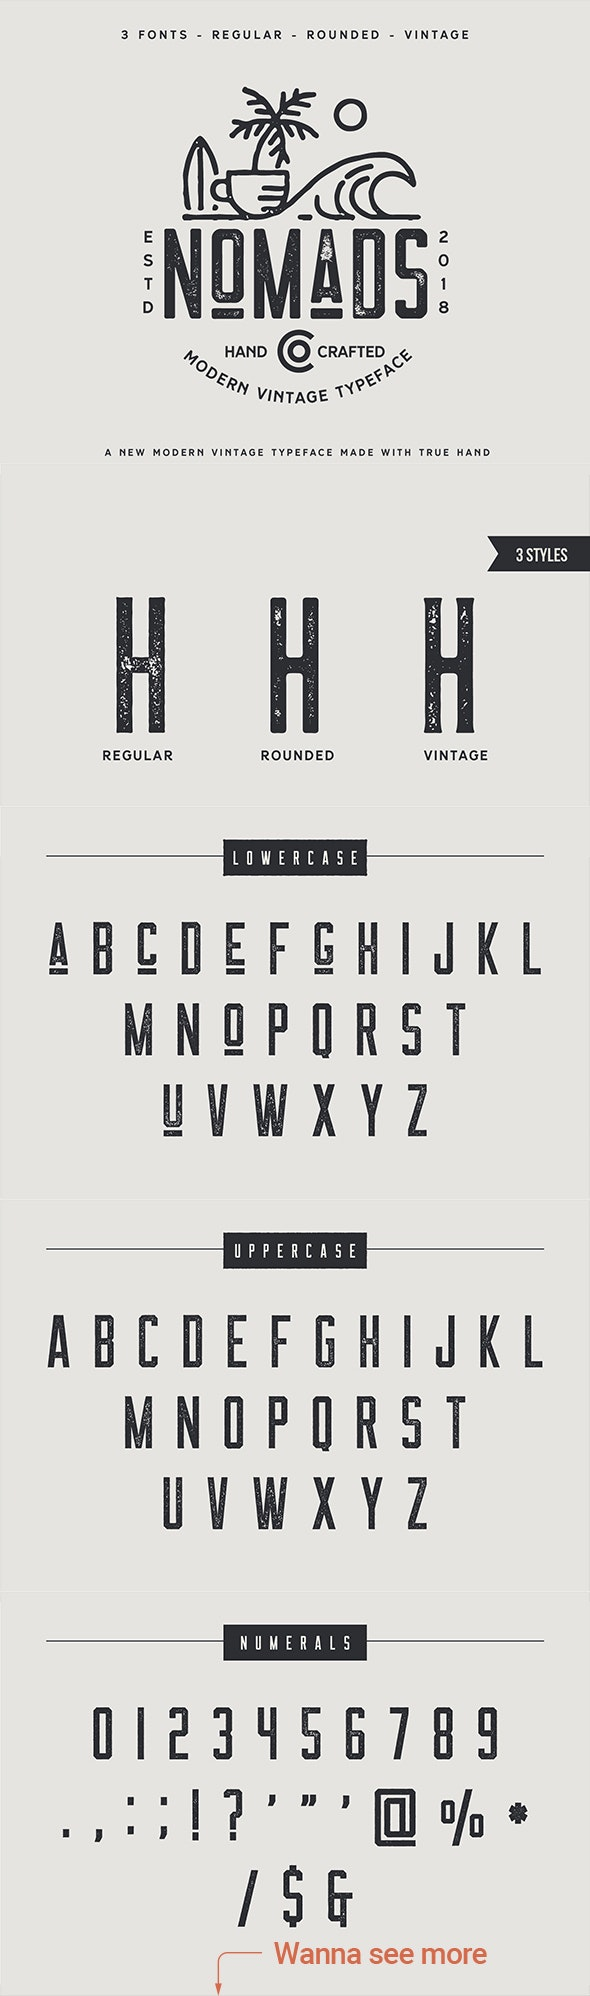 The Nomads Font - Condensed Typeface - Sans-Serif Fonts